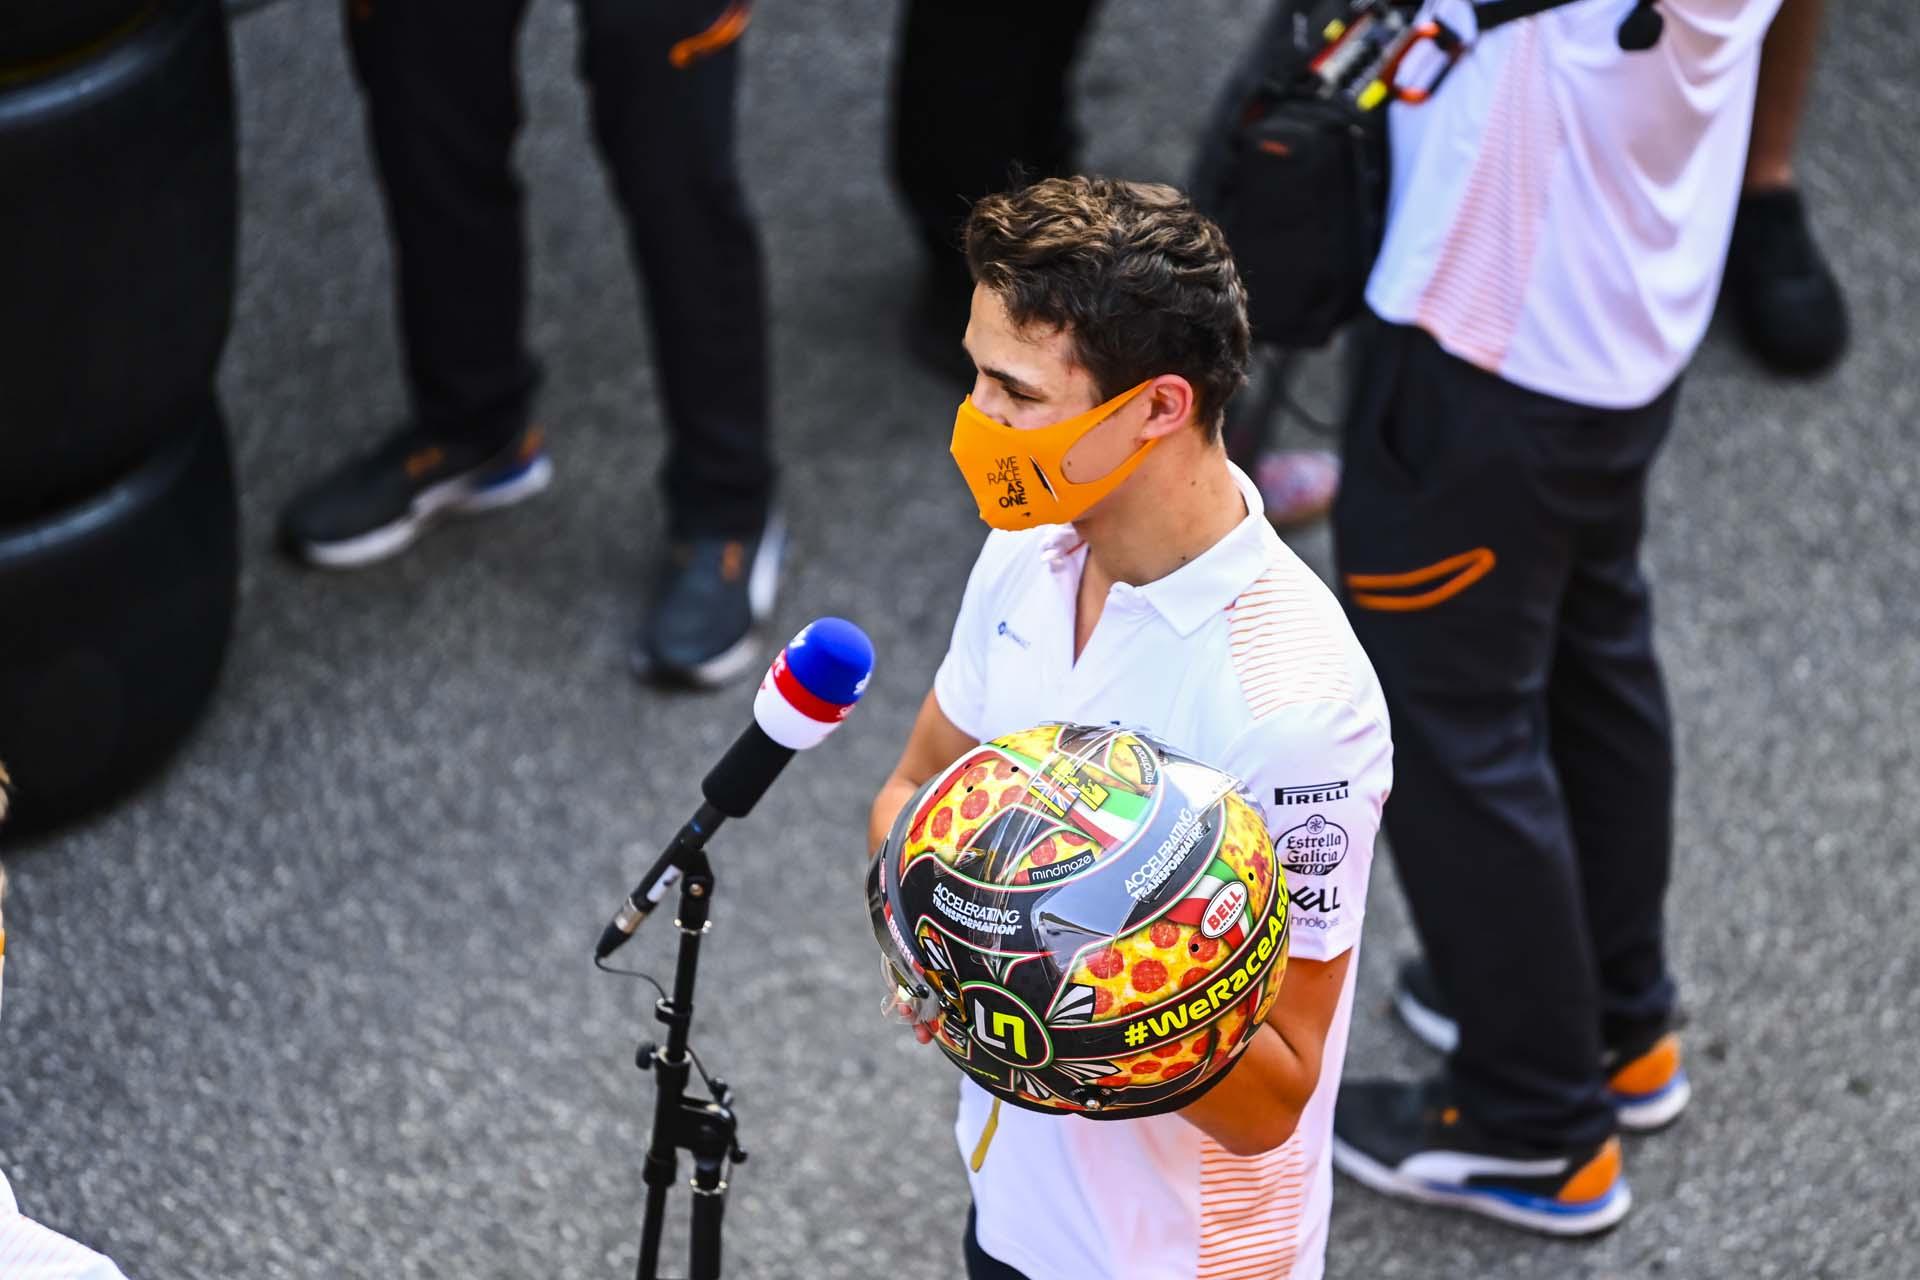 Lando Norris, McLaren, gives an interview for Sky Sports